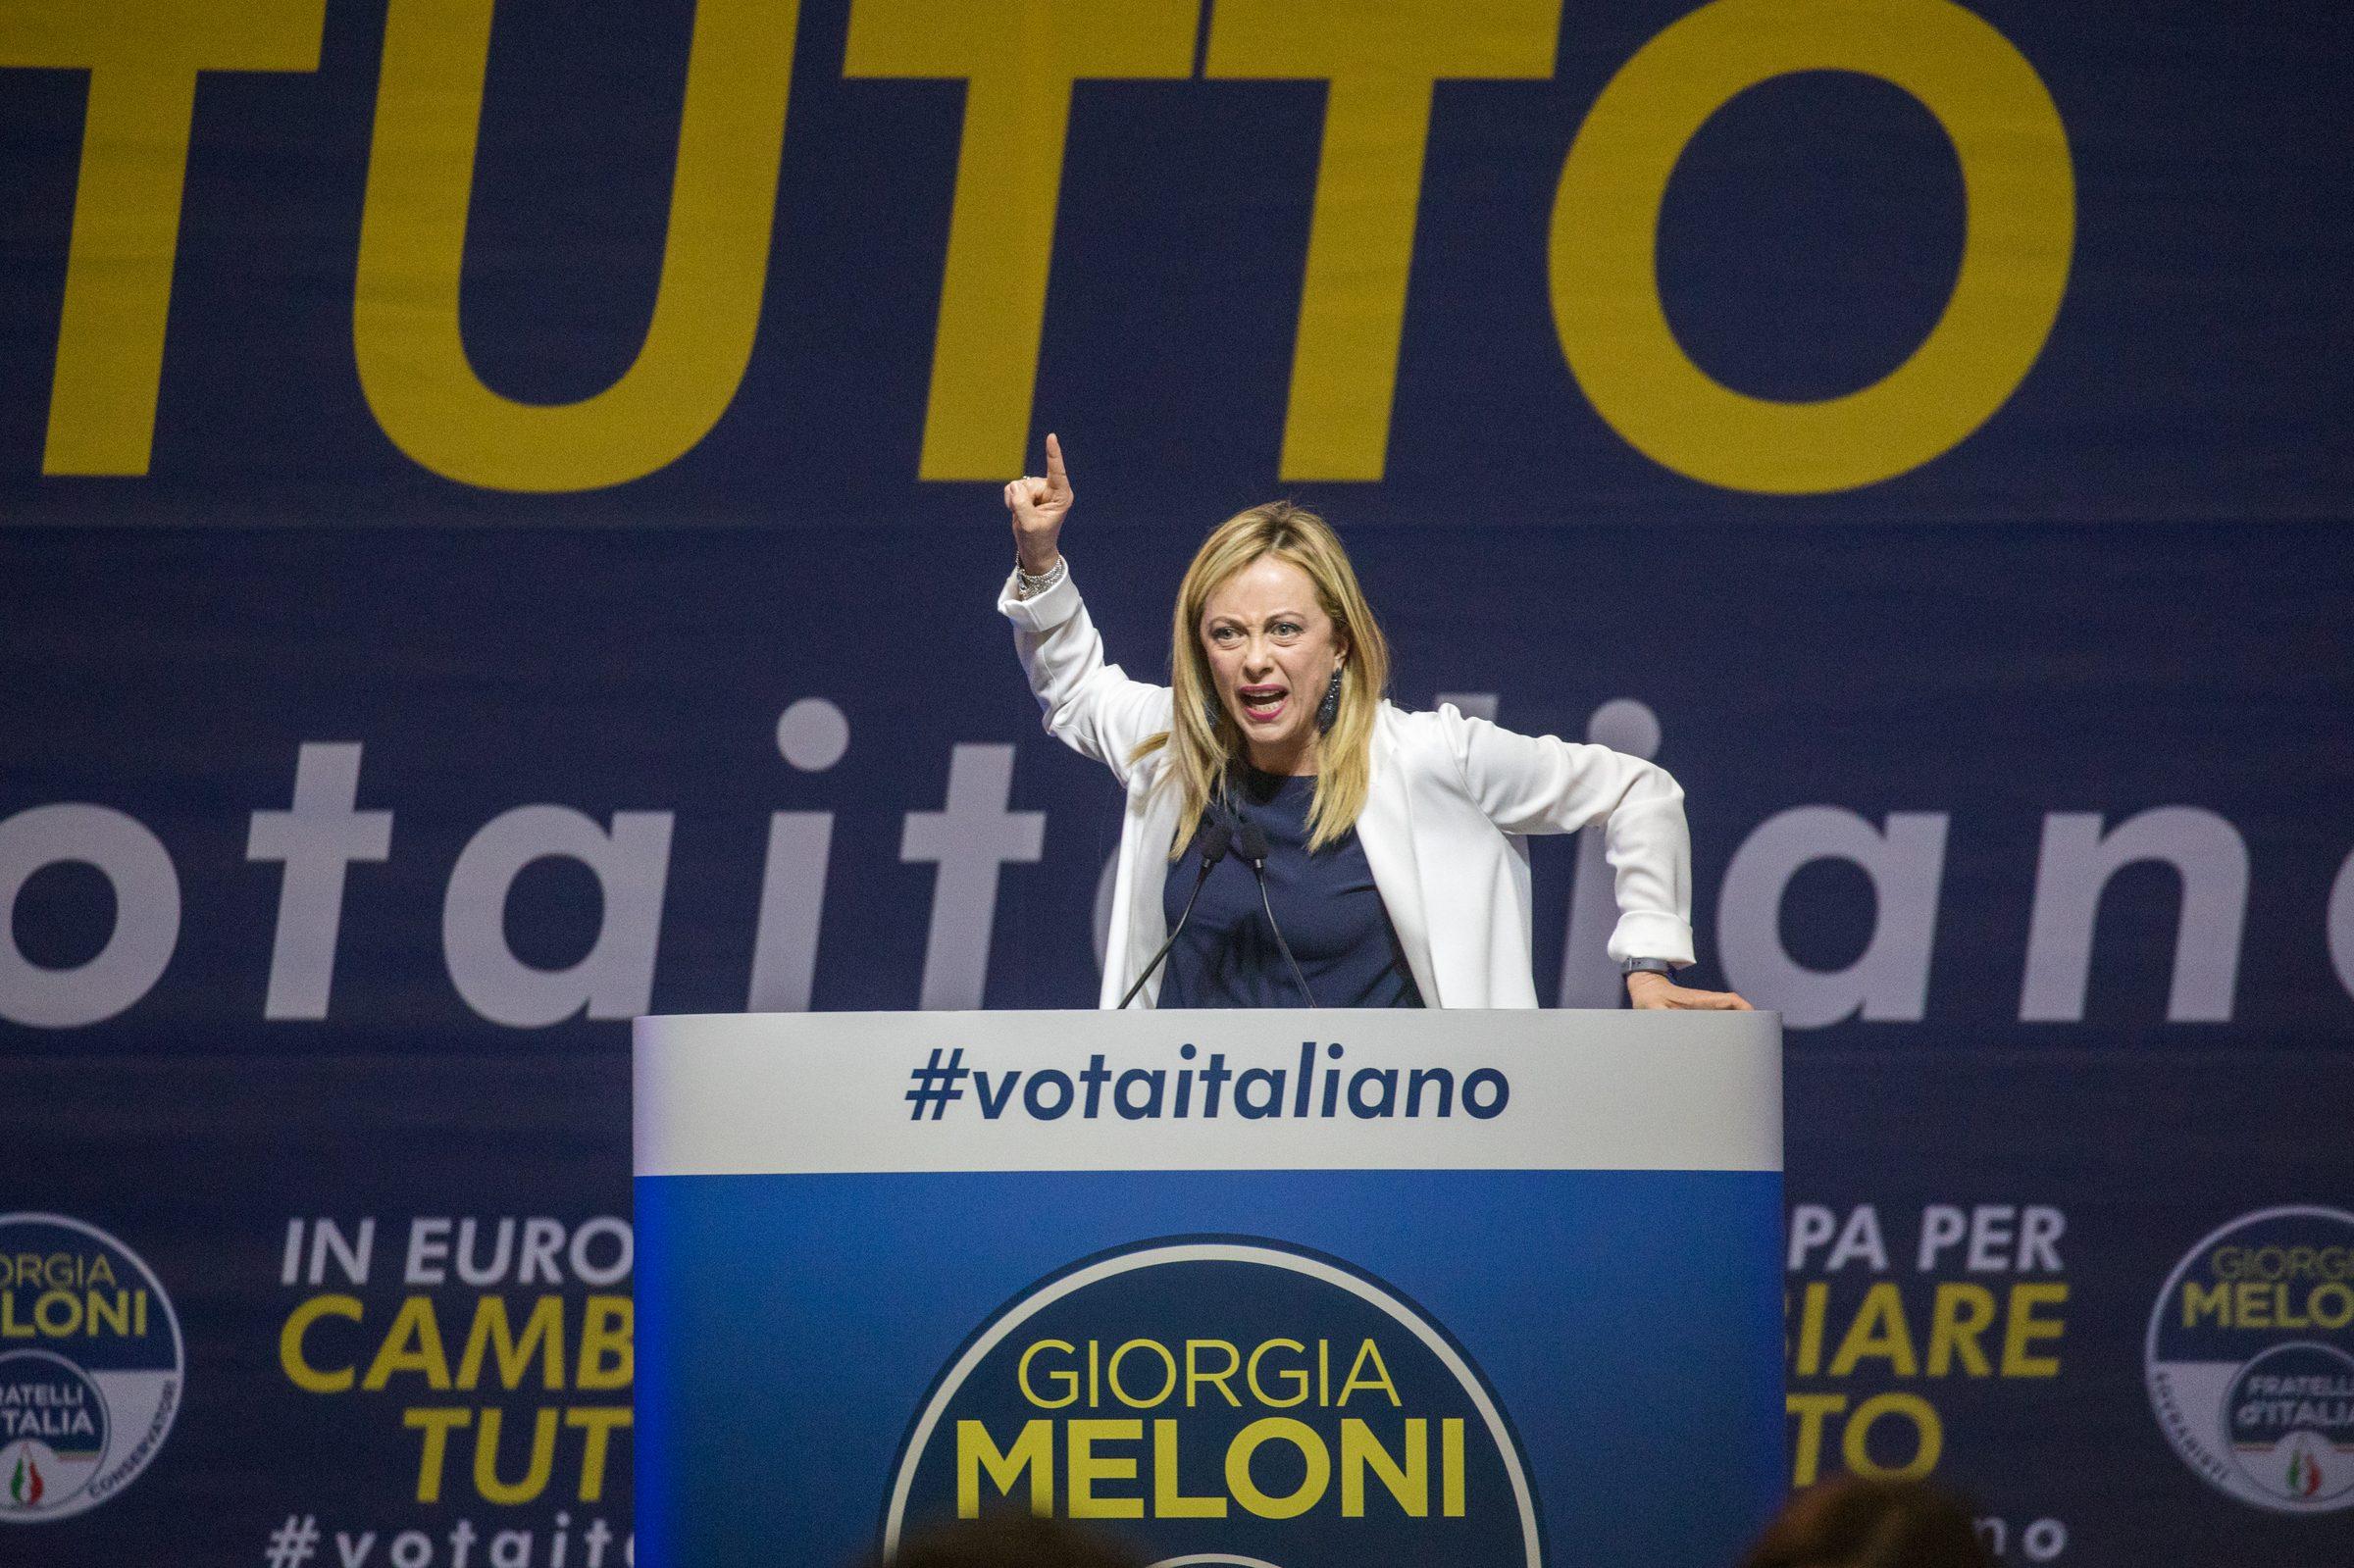 Elezioni europee 2019: i candidati di Fratelli d'Italia e le